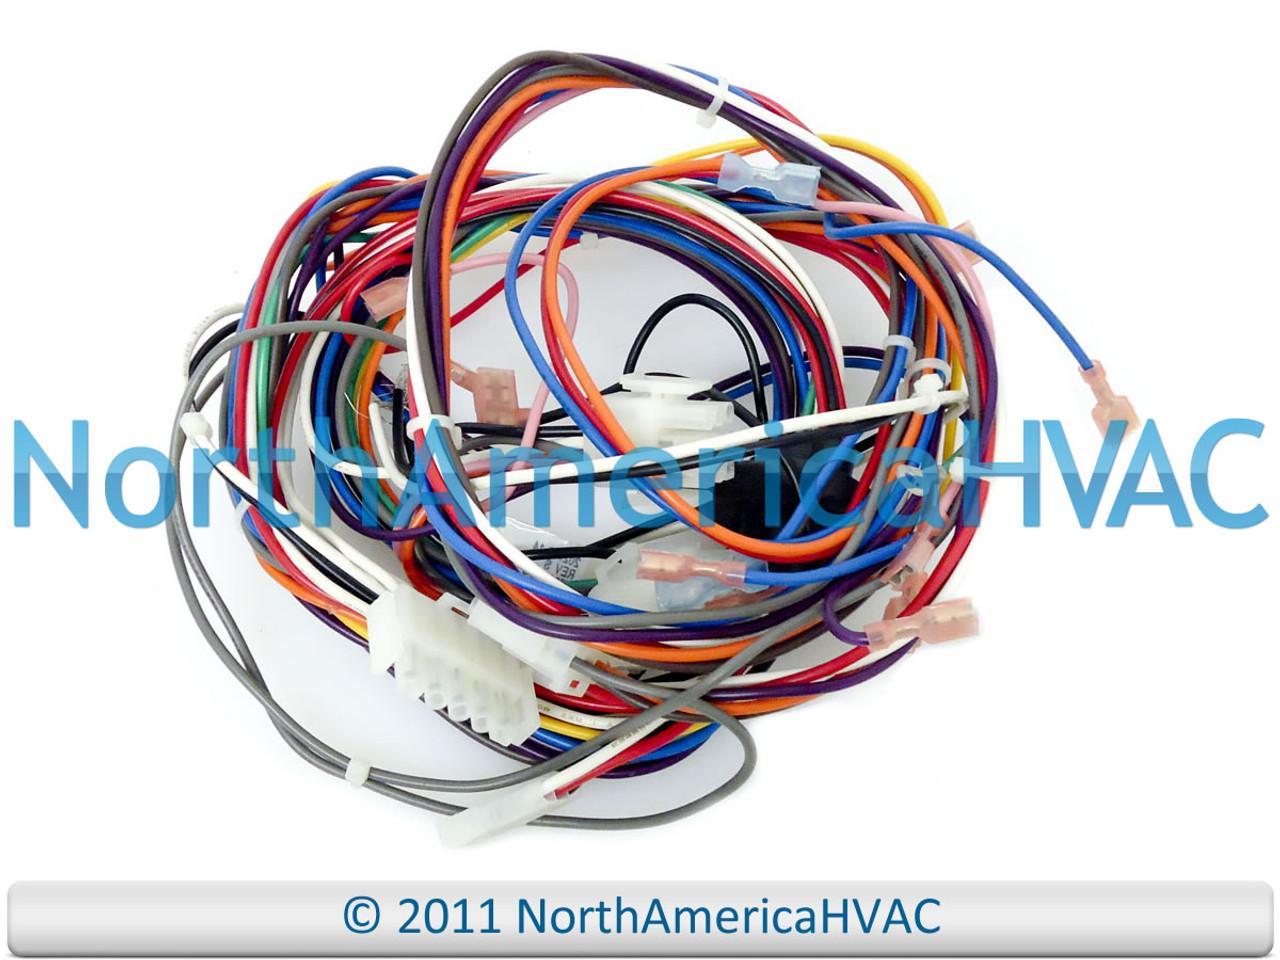 OEM Goodman Amana Janitrol Furnace Wiring Harness Connectors & Plugs  20276014 - North America HVACNorth America HVAC